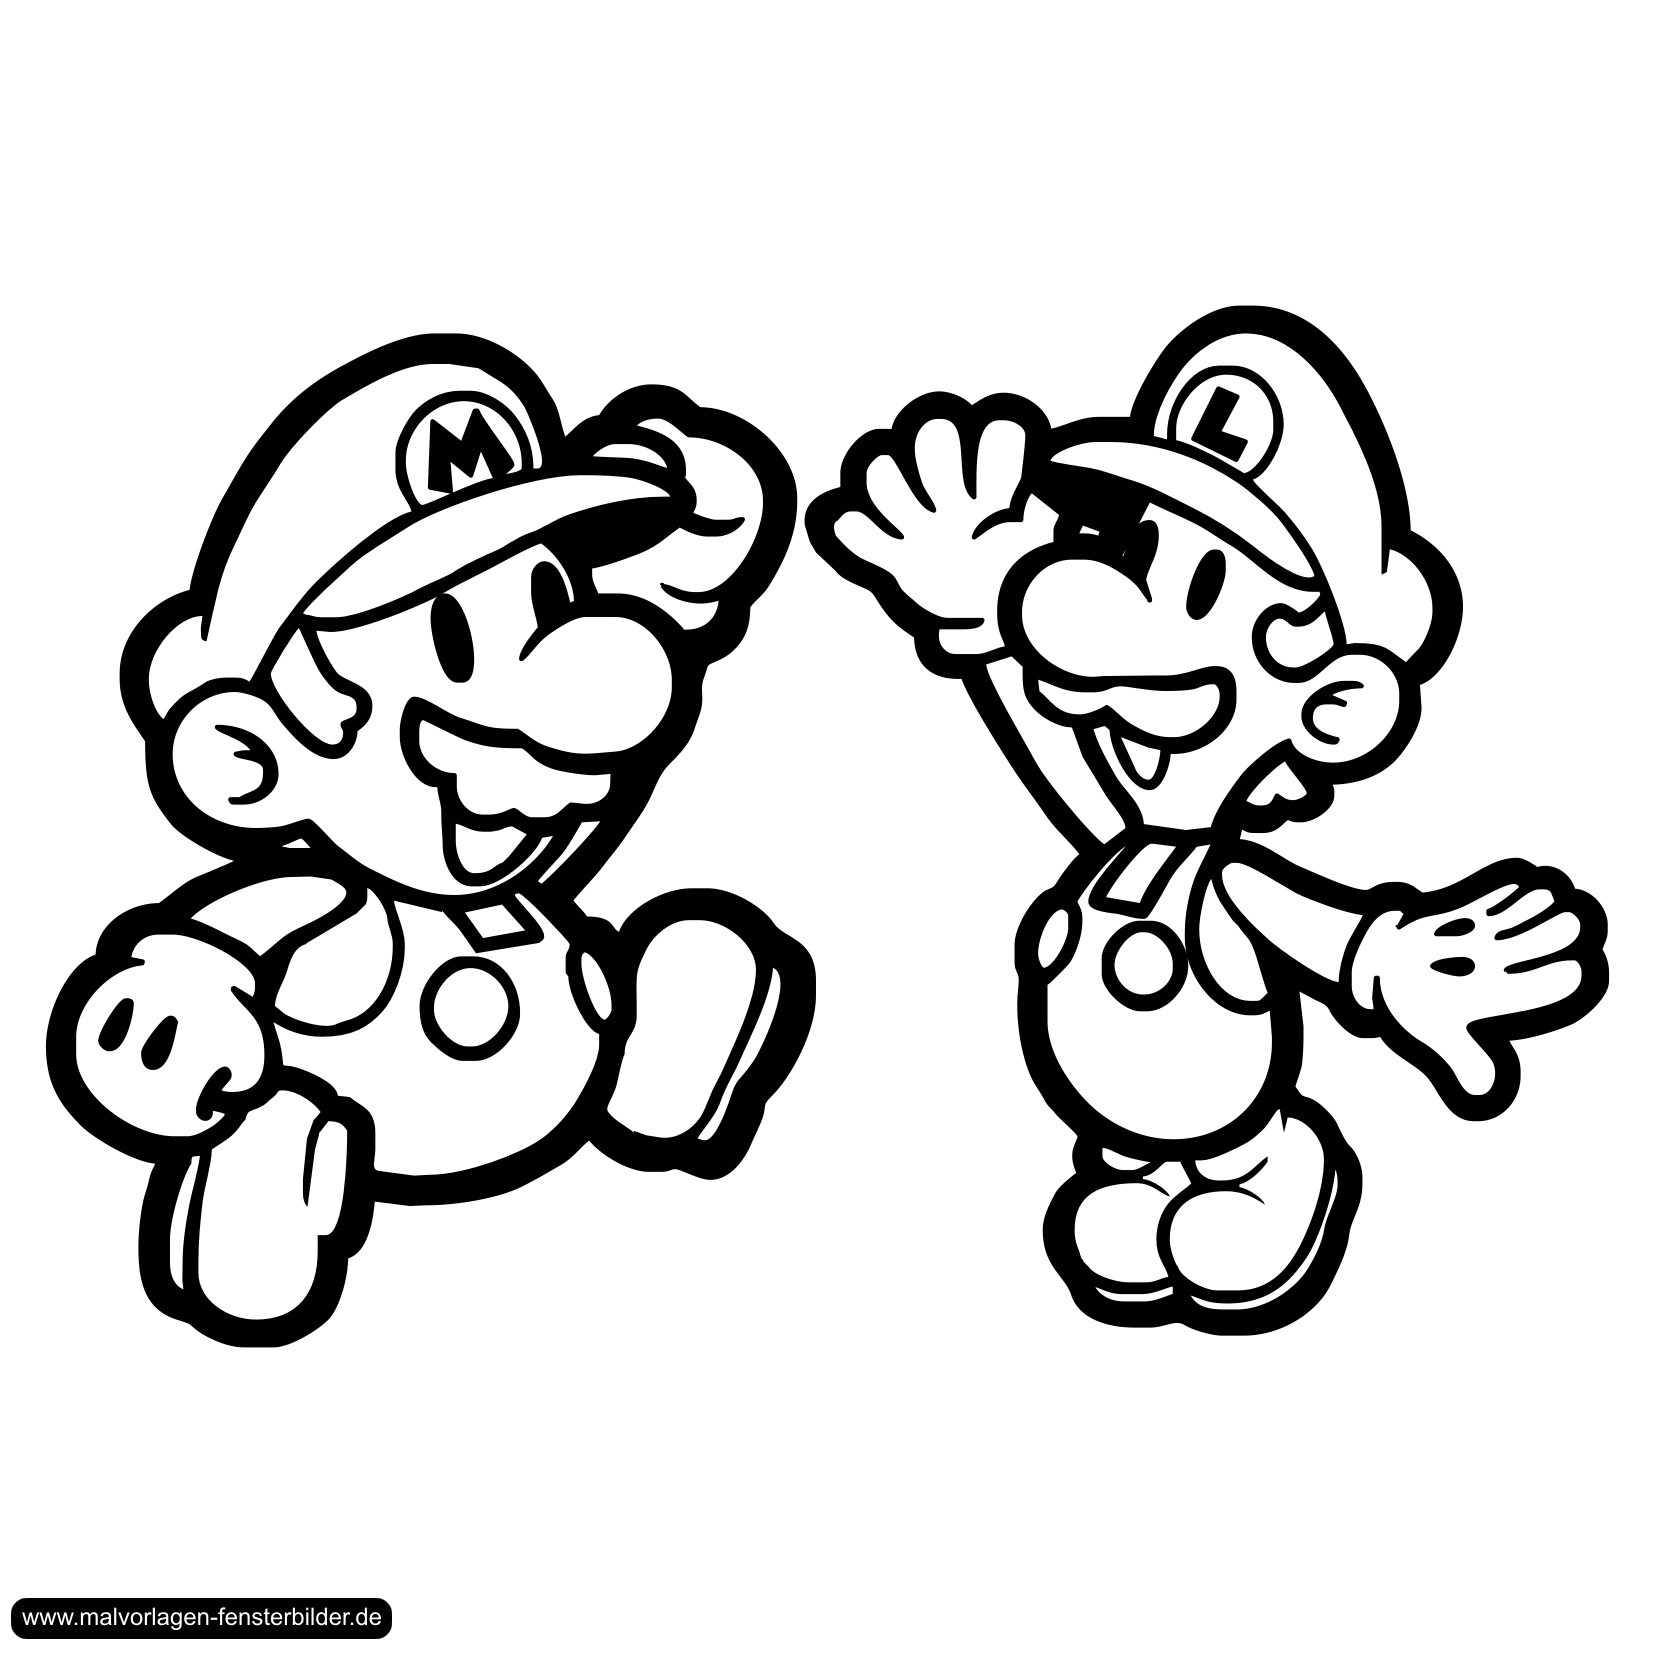 Ausmalbild Super Mario Neu Malvorlagen Super Mario Yoshi Luxus Yoshi Baby Ausmalbilder Galerie